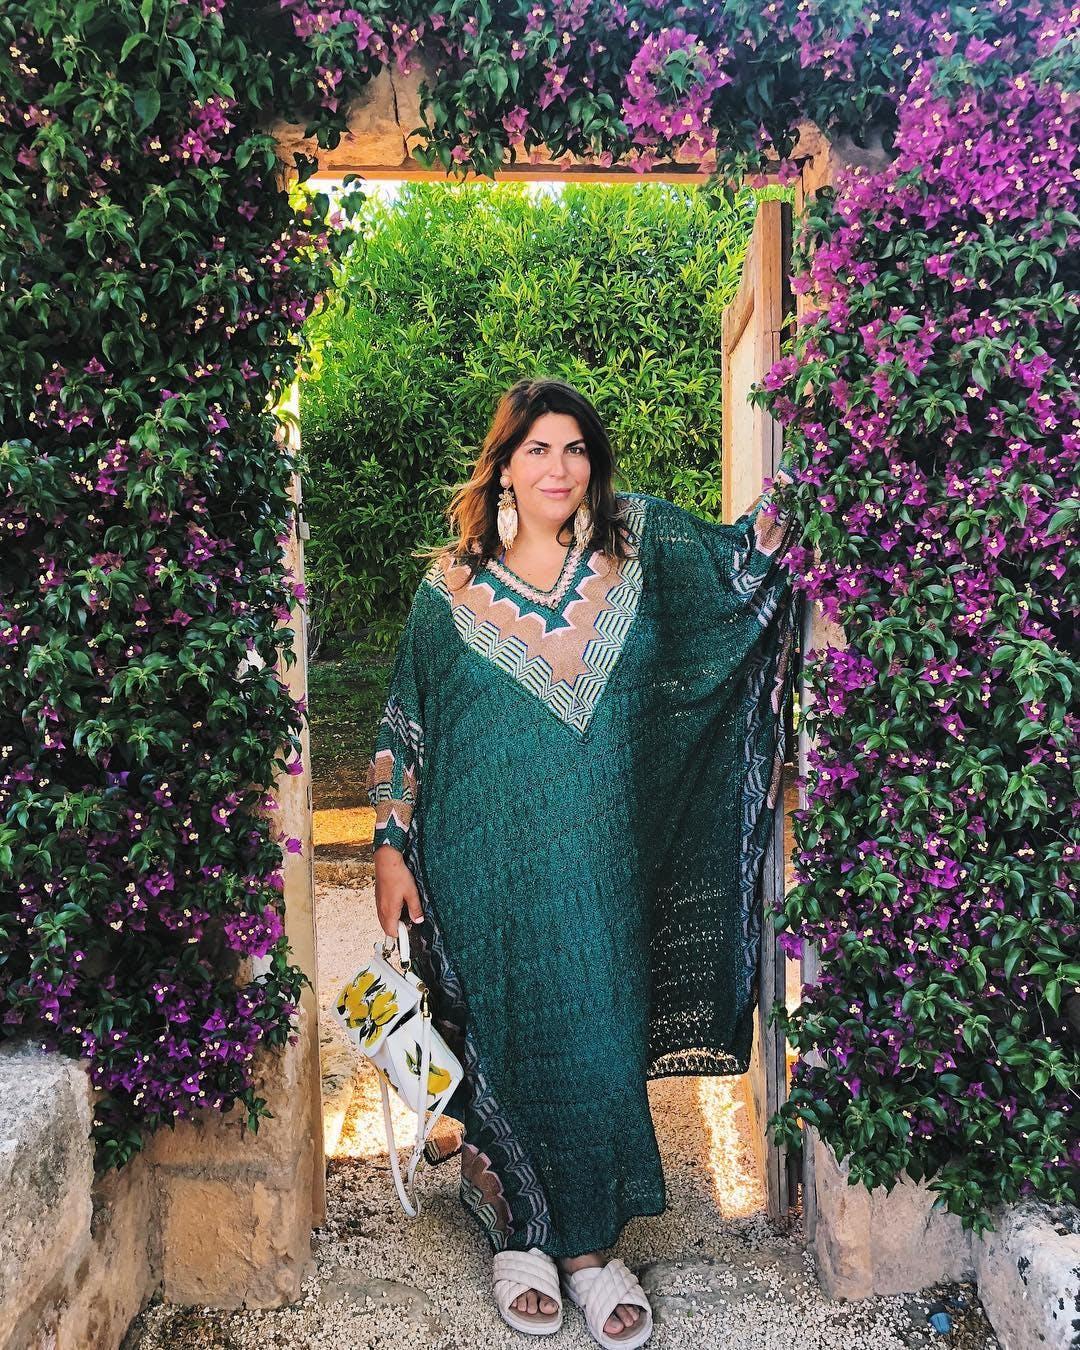 a woman wearing a glamorous caftan